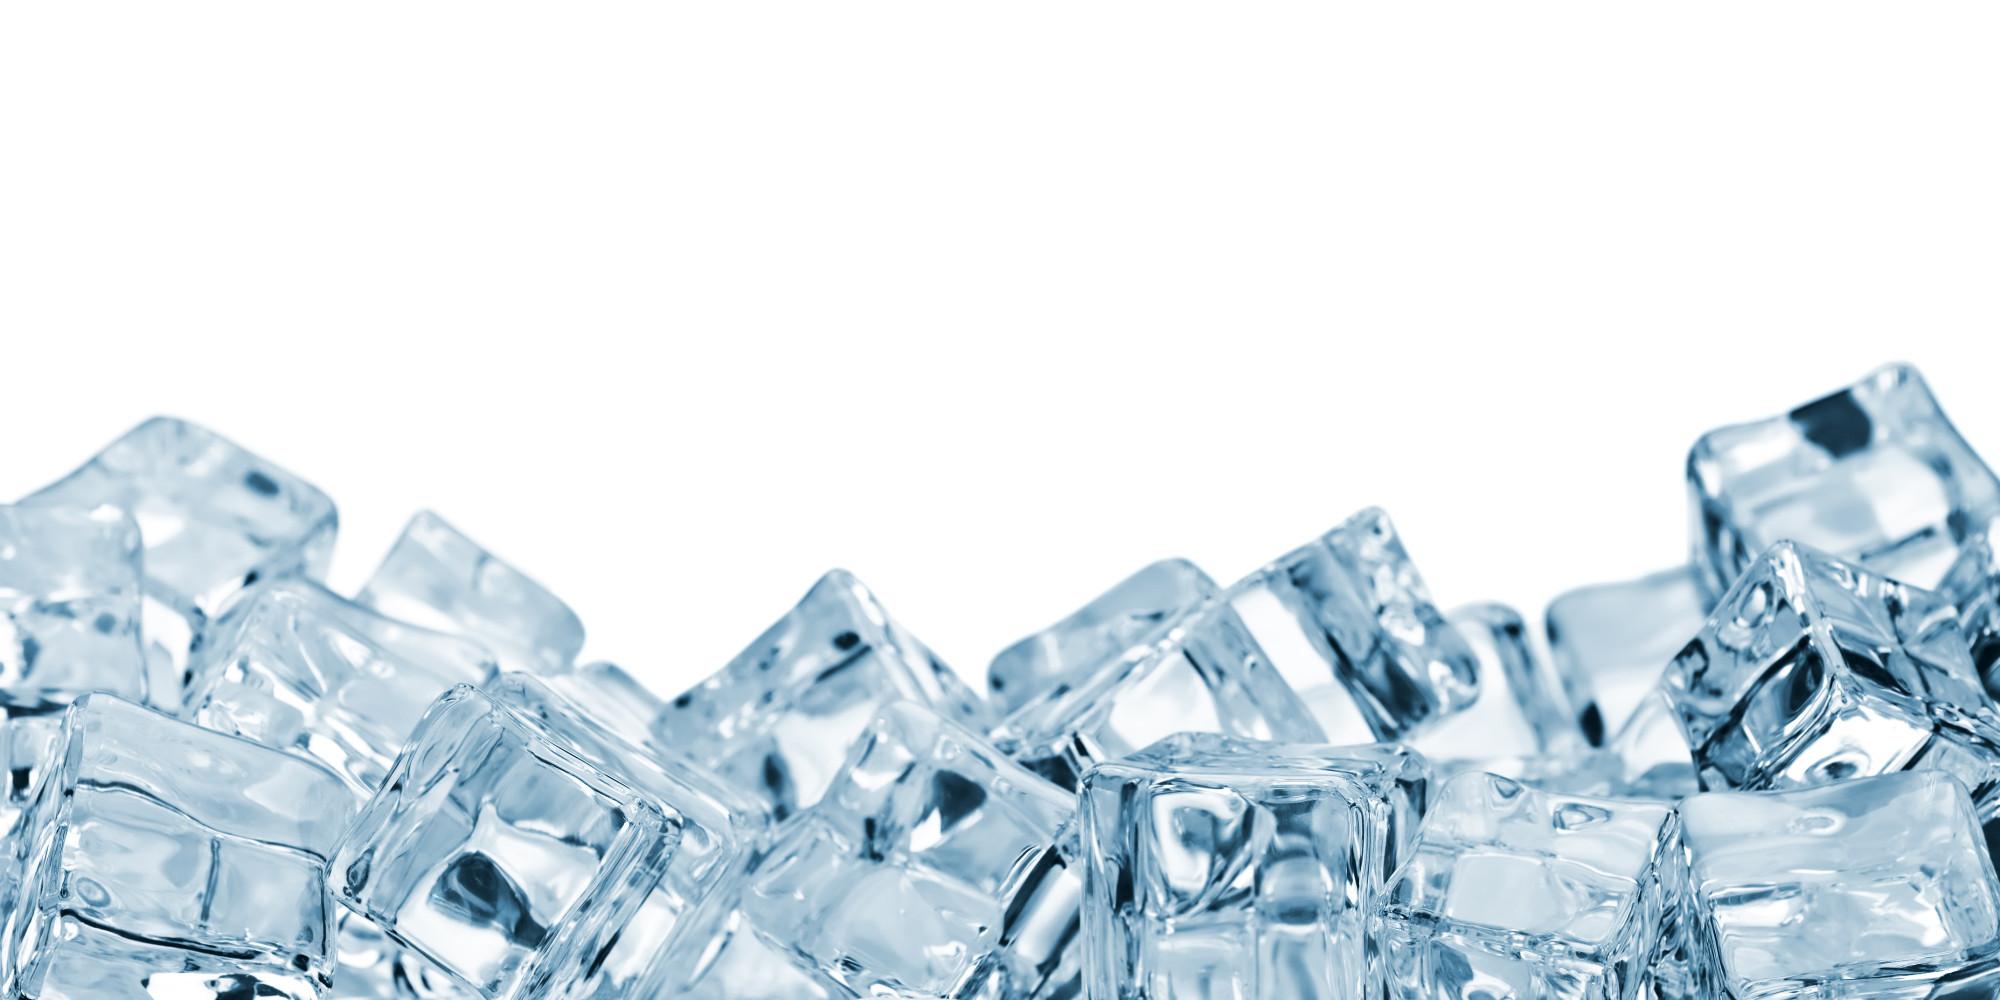 Icecube HD PNG - 119123